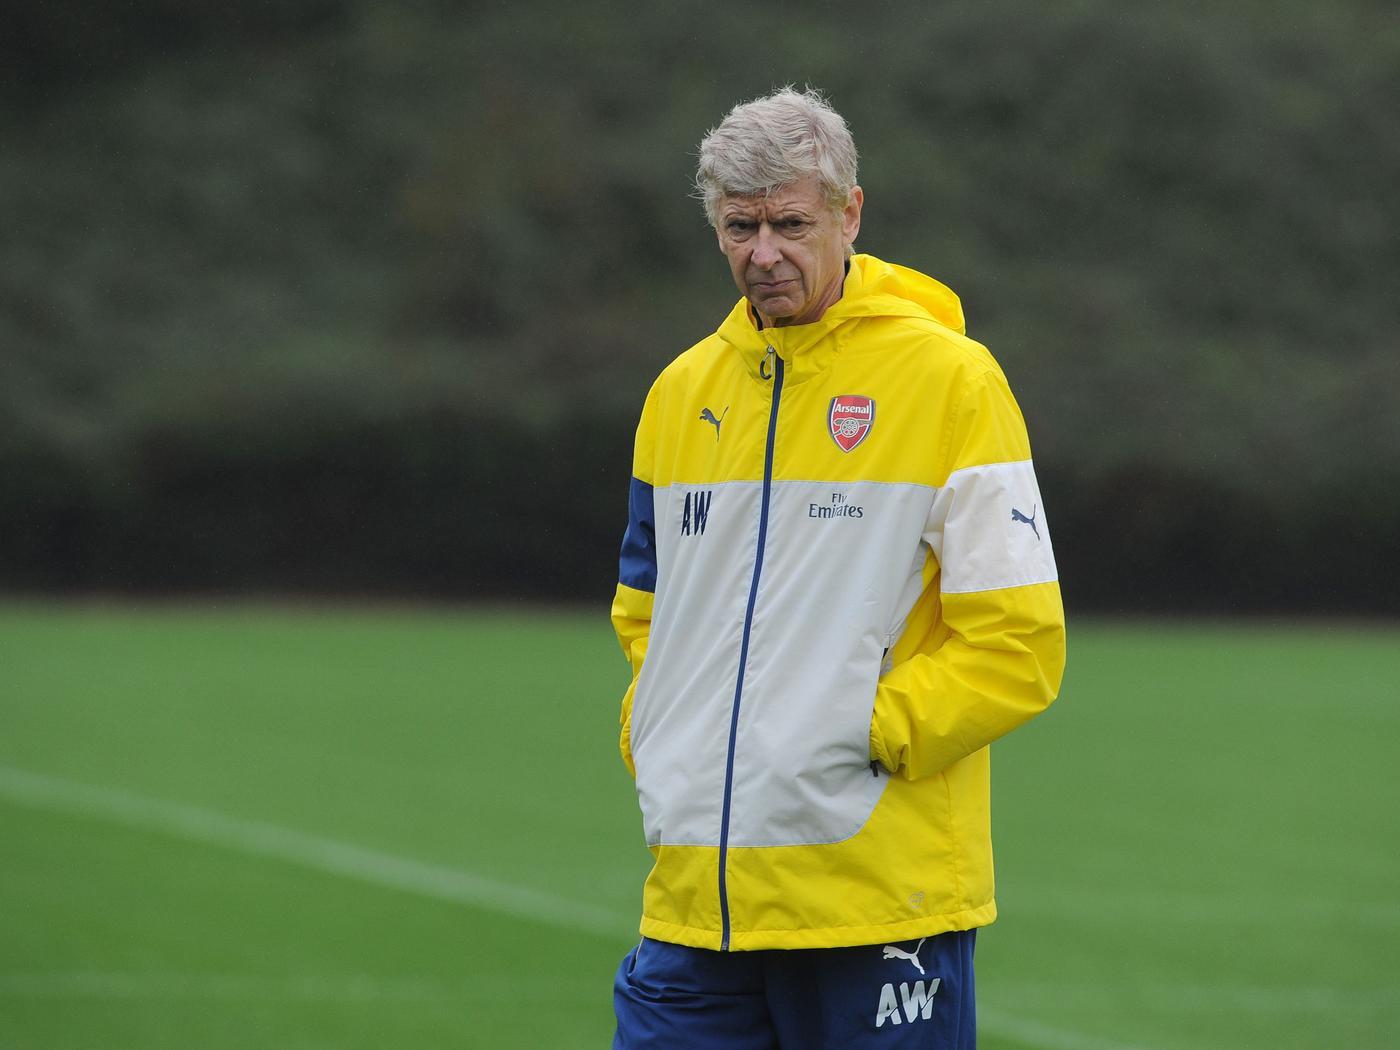 Arsene Wenger's lack of regret concerning Cesc Fabregas transfer snub shows he is losing it at Arsenal